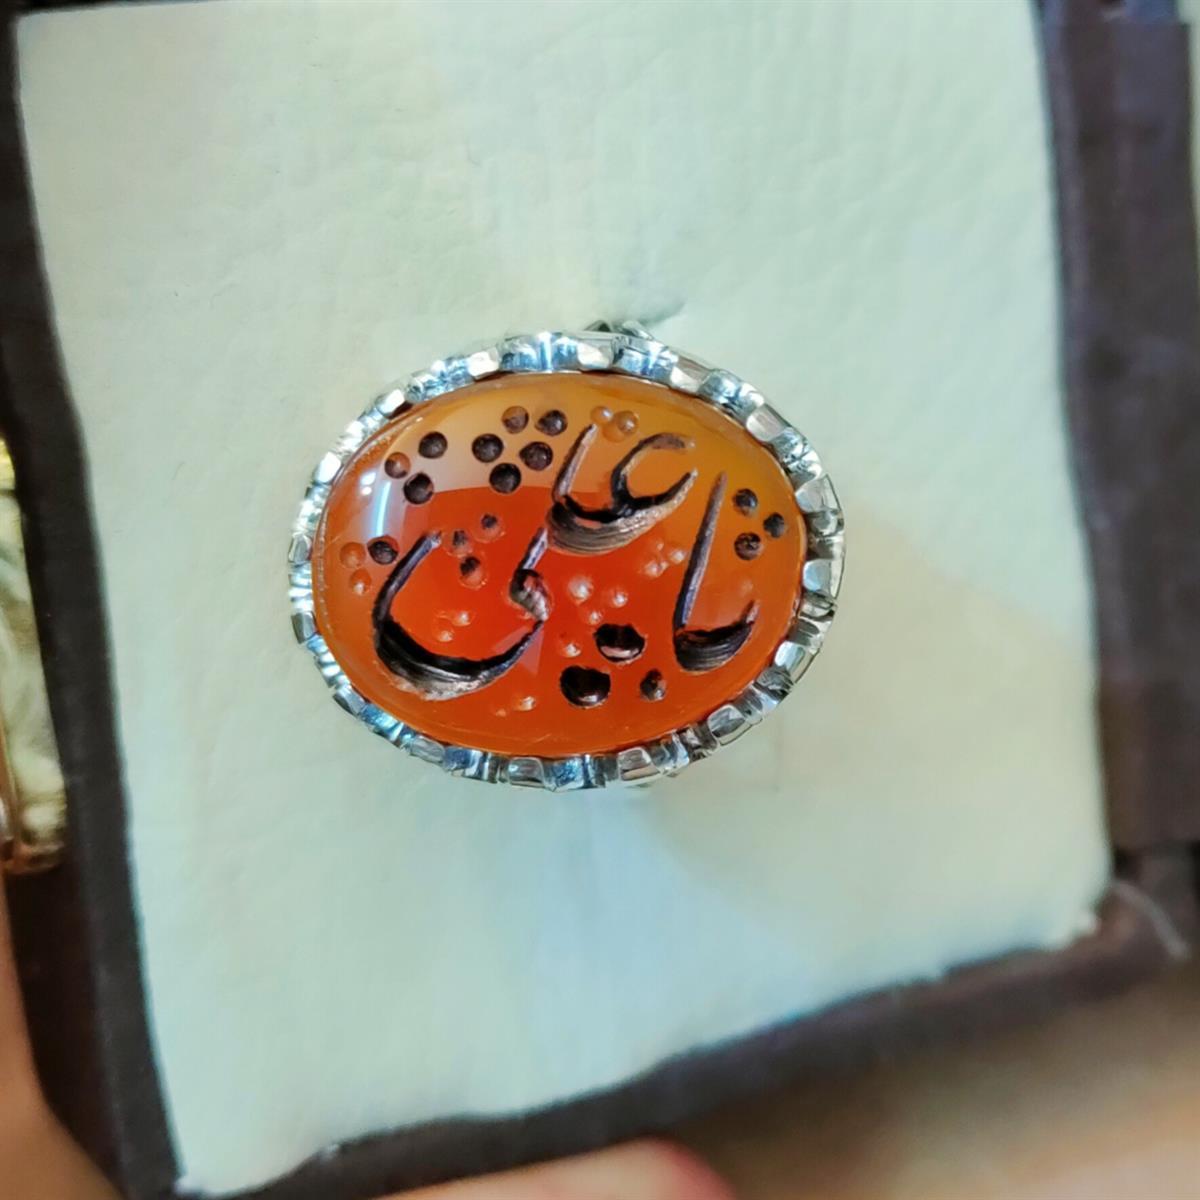 Red Aqeeq Yemeni Aqiq Ring Ya Ali Engraved Handmade Silver 925 Ring 2 natural gemstones pakistan + 925 silver jewelry online